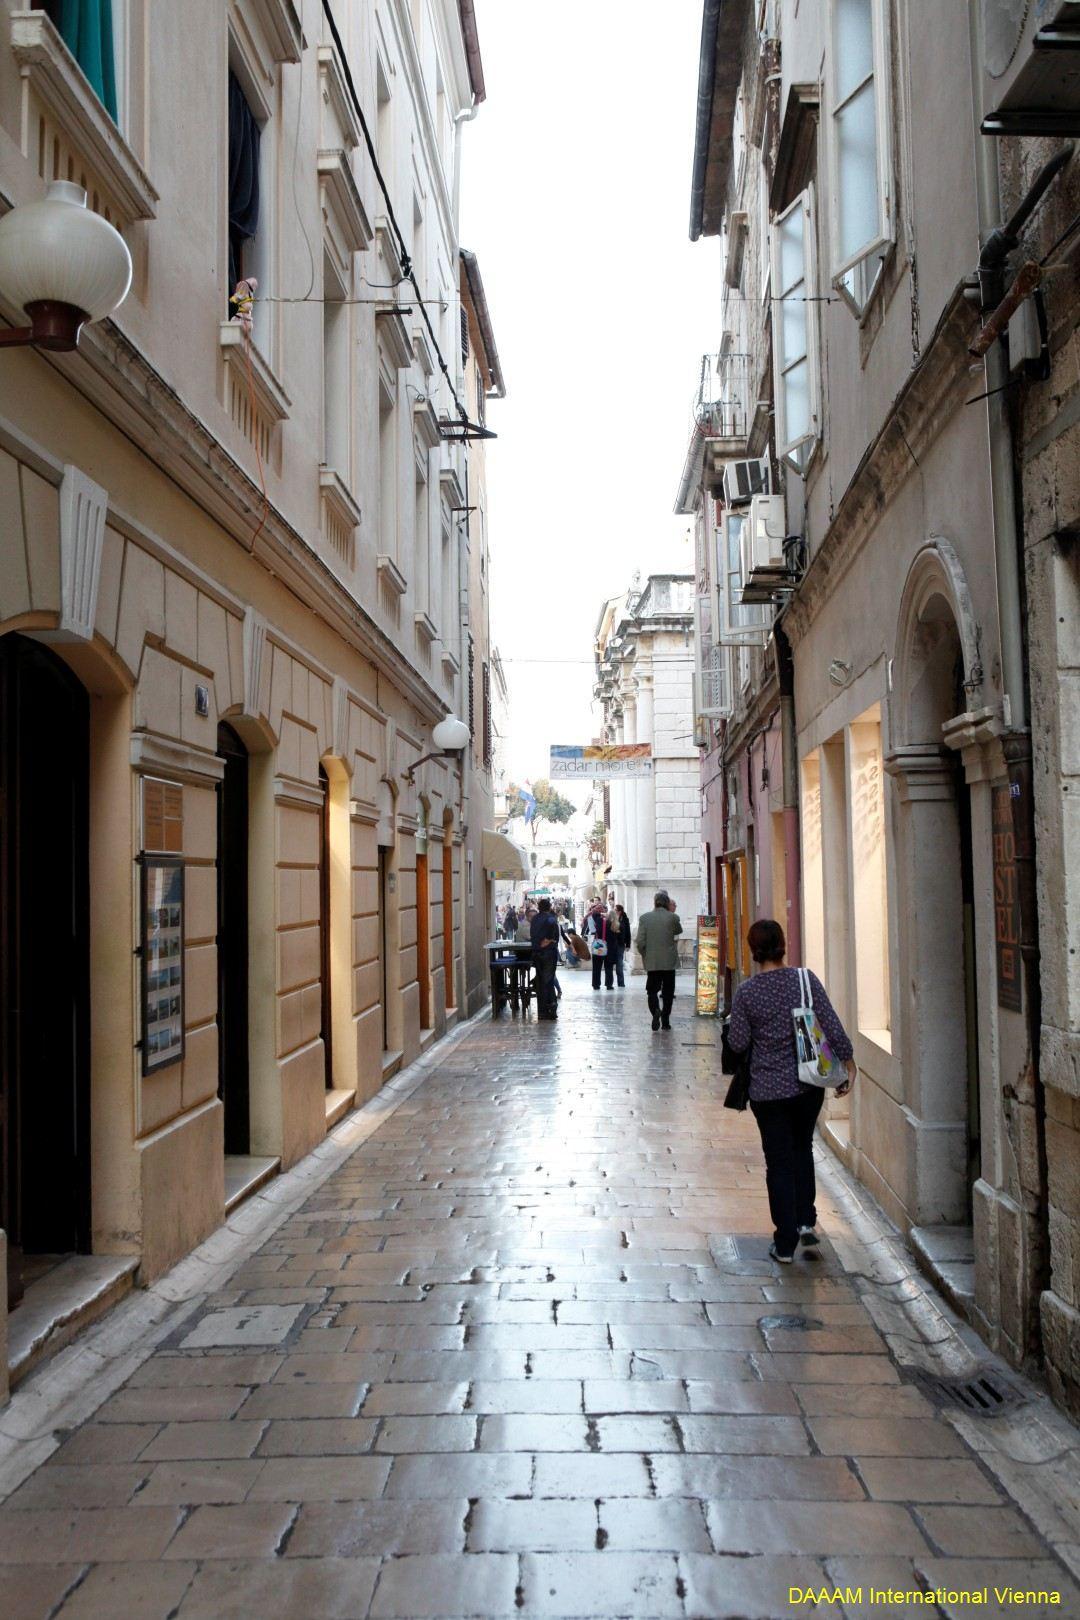 DAAAM_2012_Zadar_00_Zadar_City_006